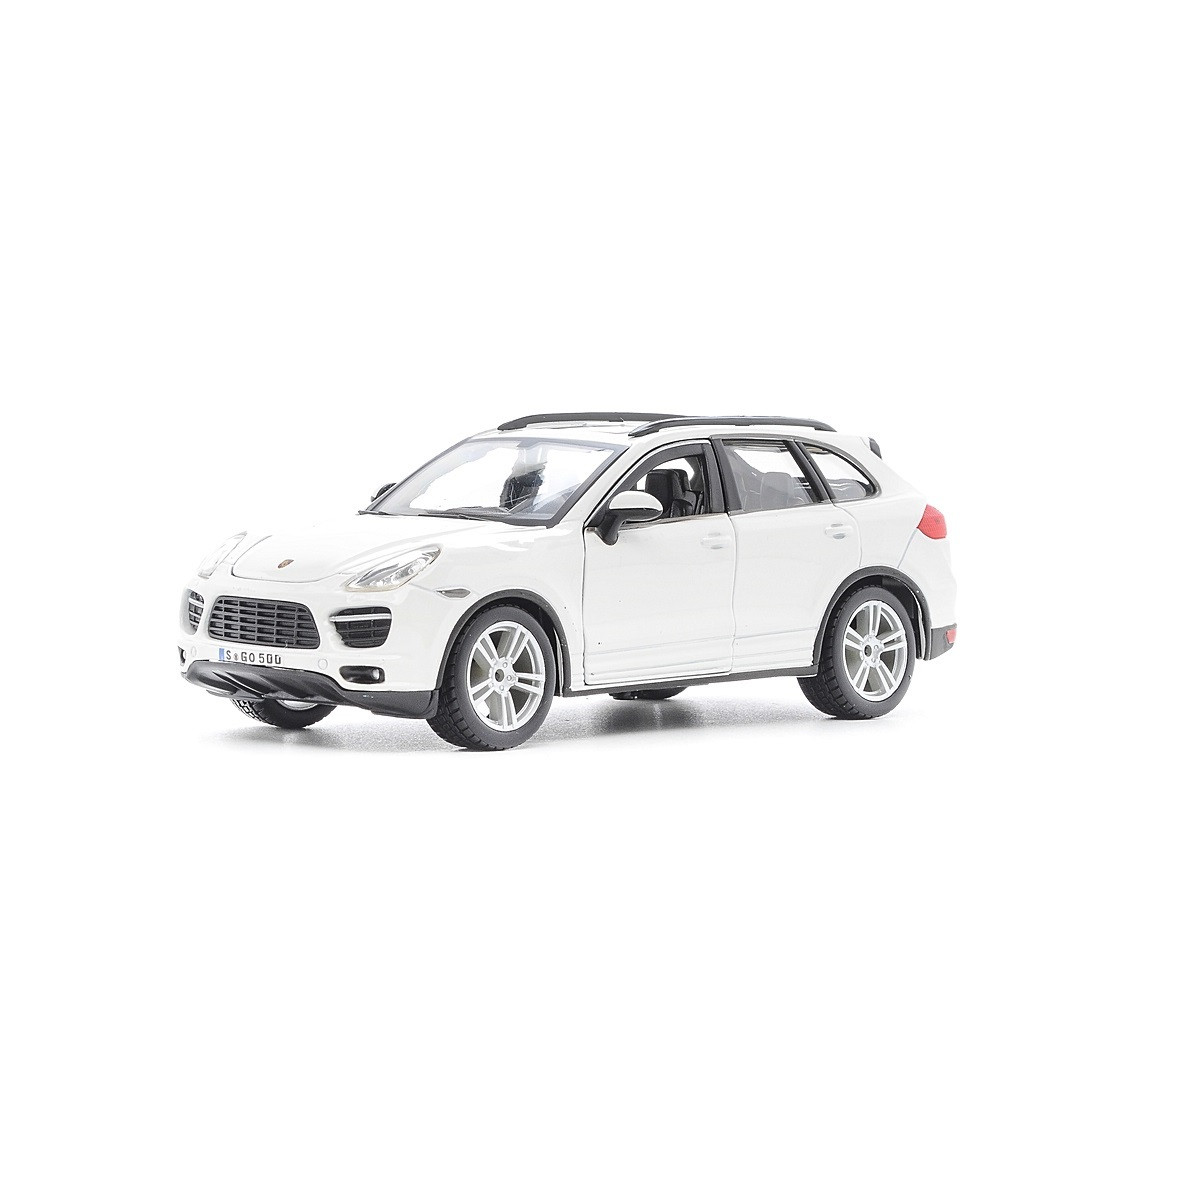 Автомодель - PORSCHE CAYENNE TURBO (ассорти белый, желтый, 1:24), 18-21056